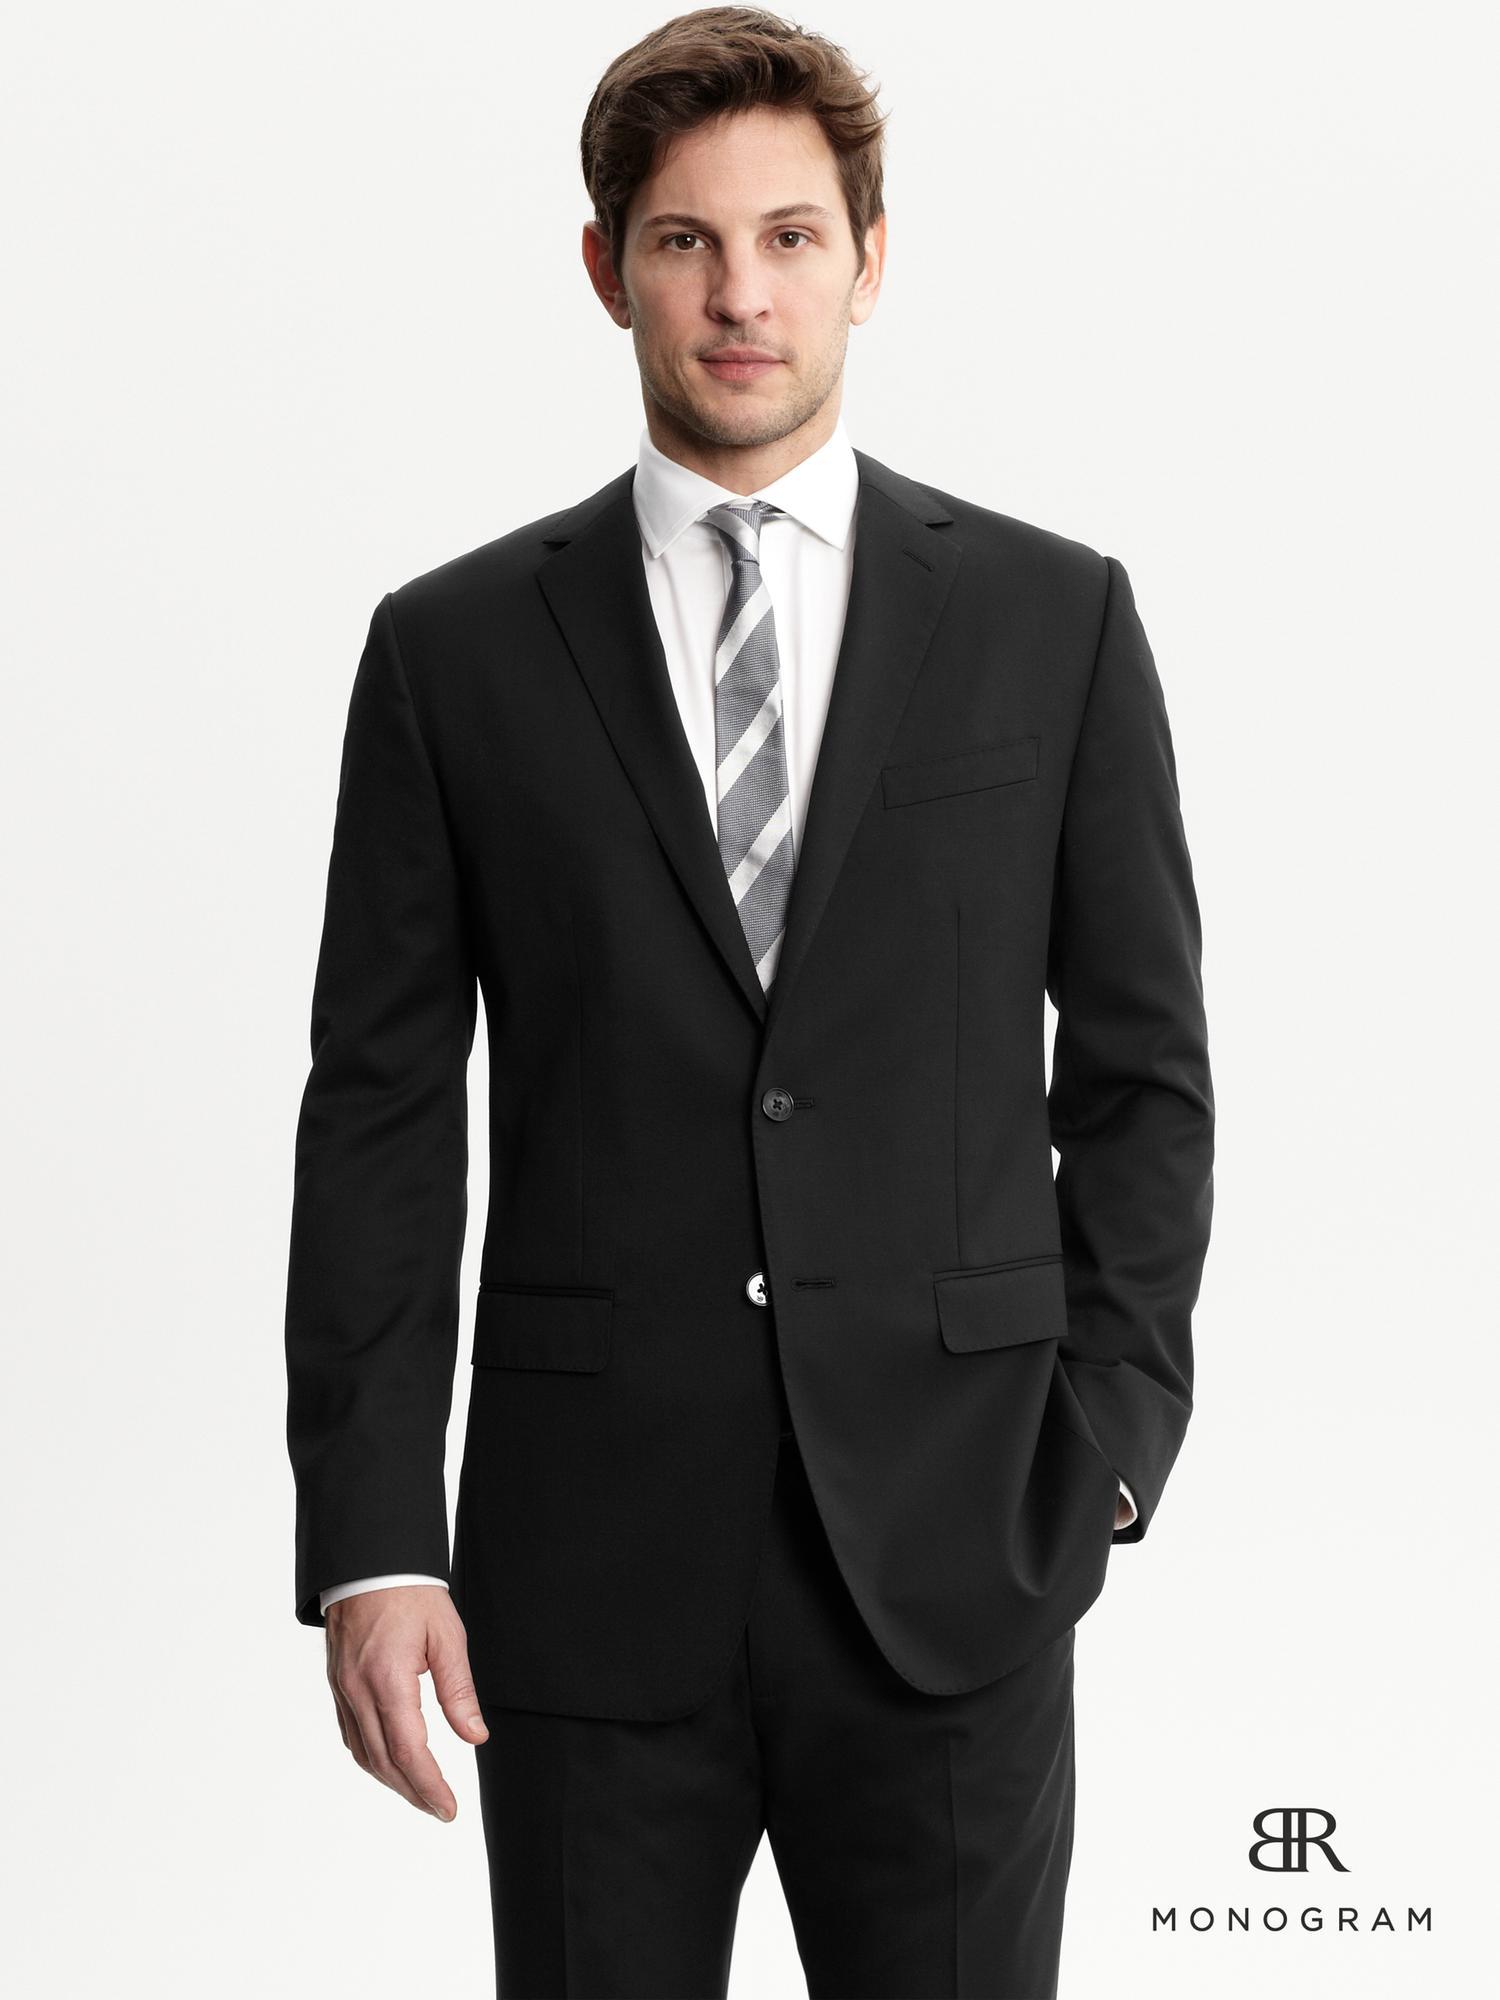 banana republic br monogram black italian wool suit jacket in black for men